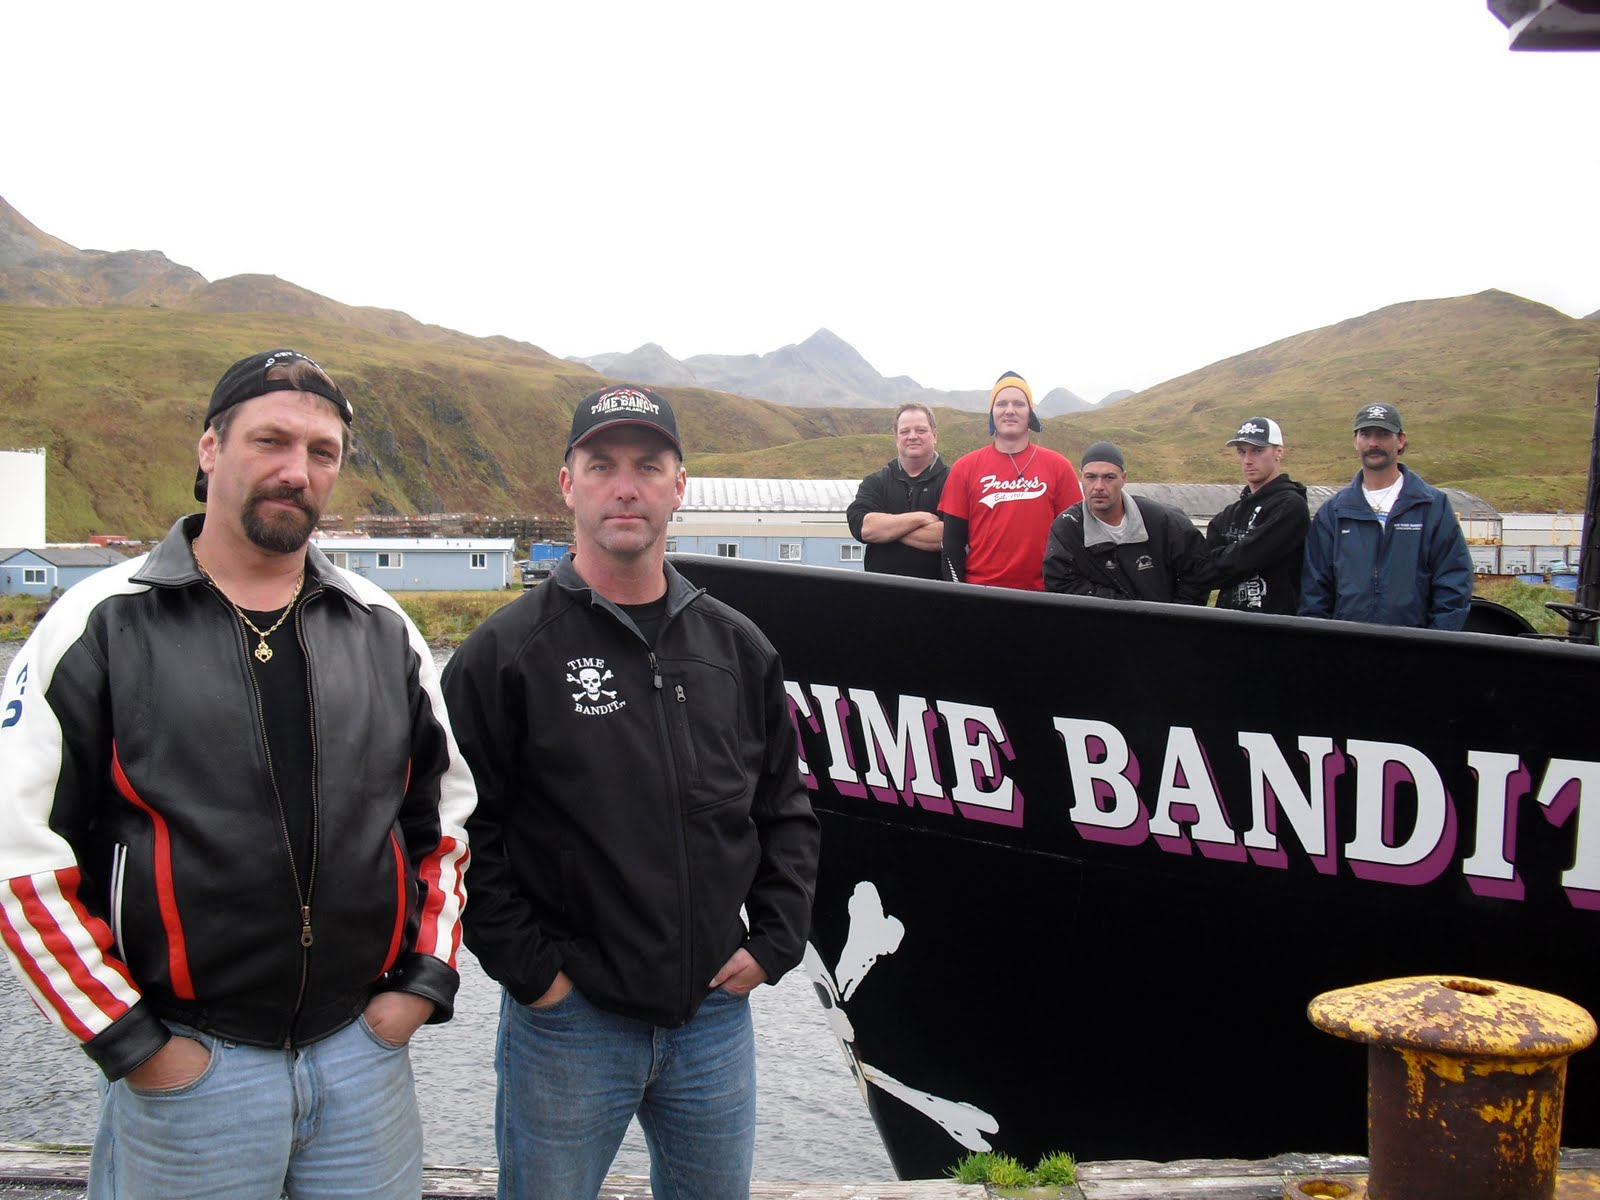 Deadliest catch time bandit crew